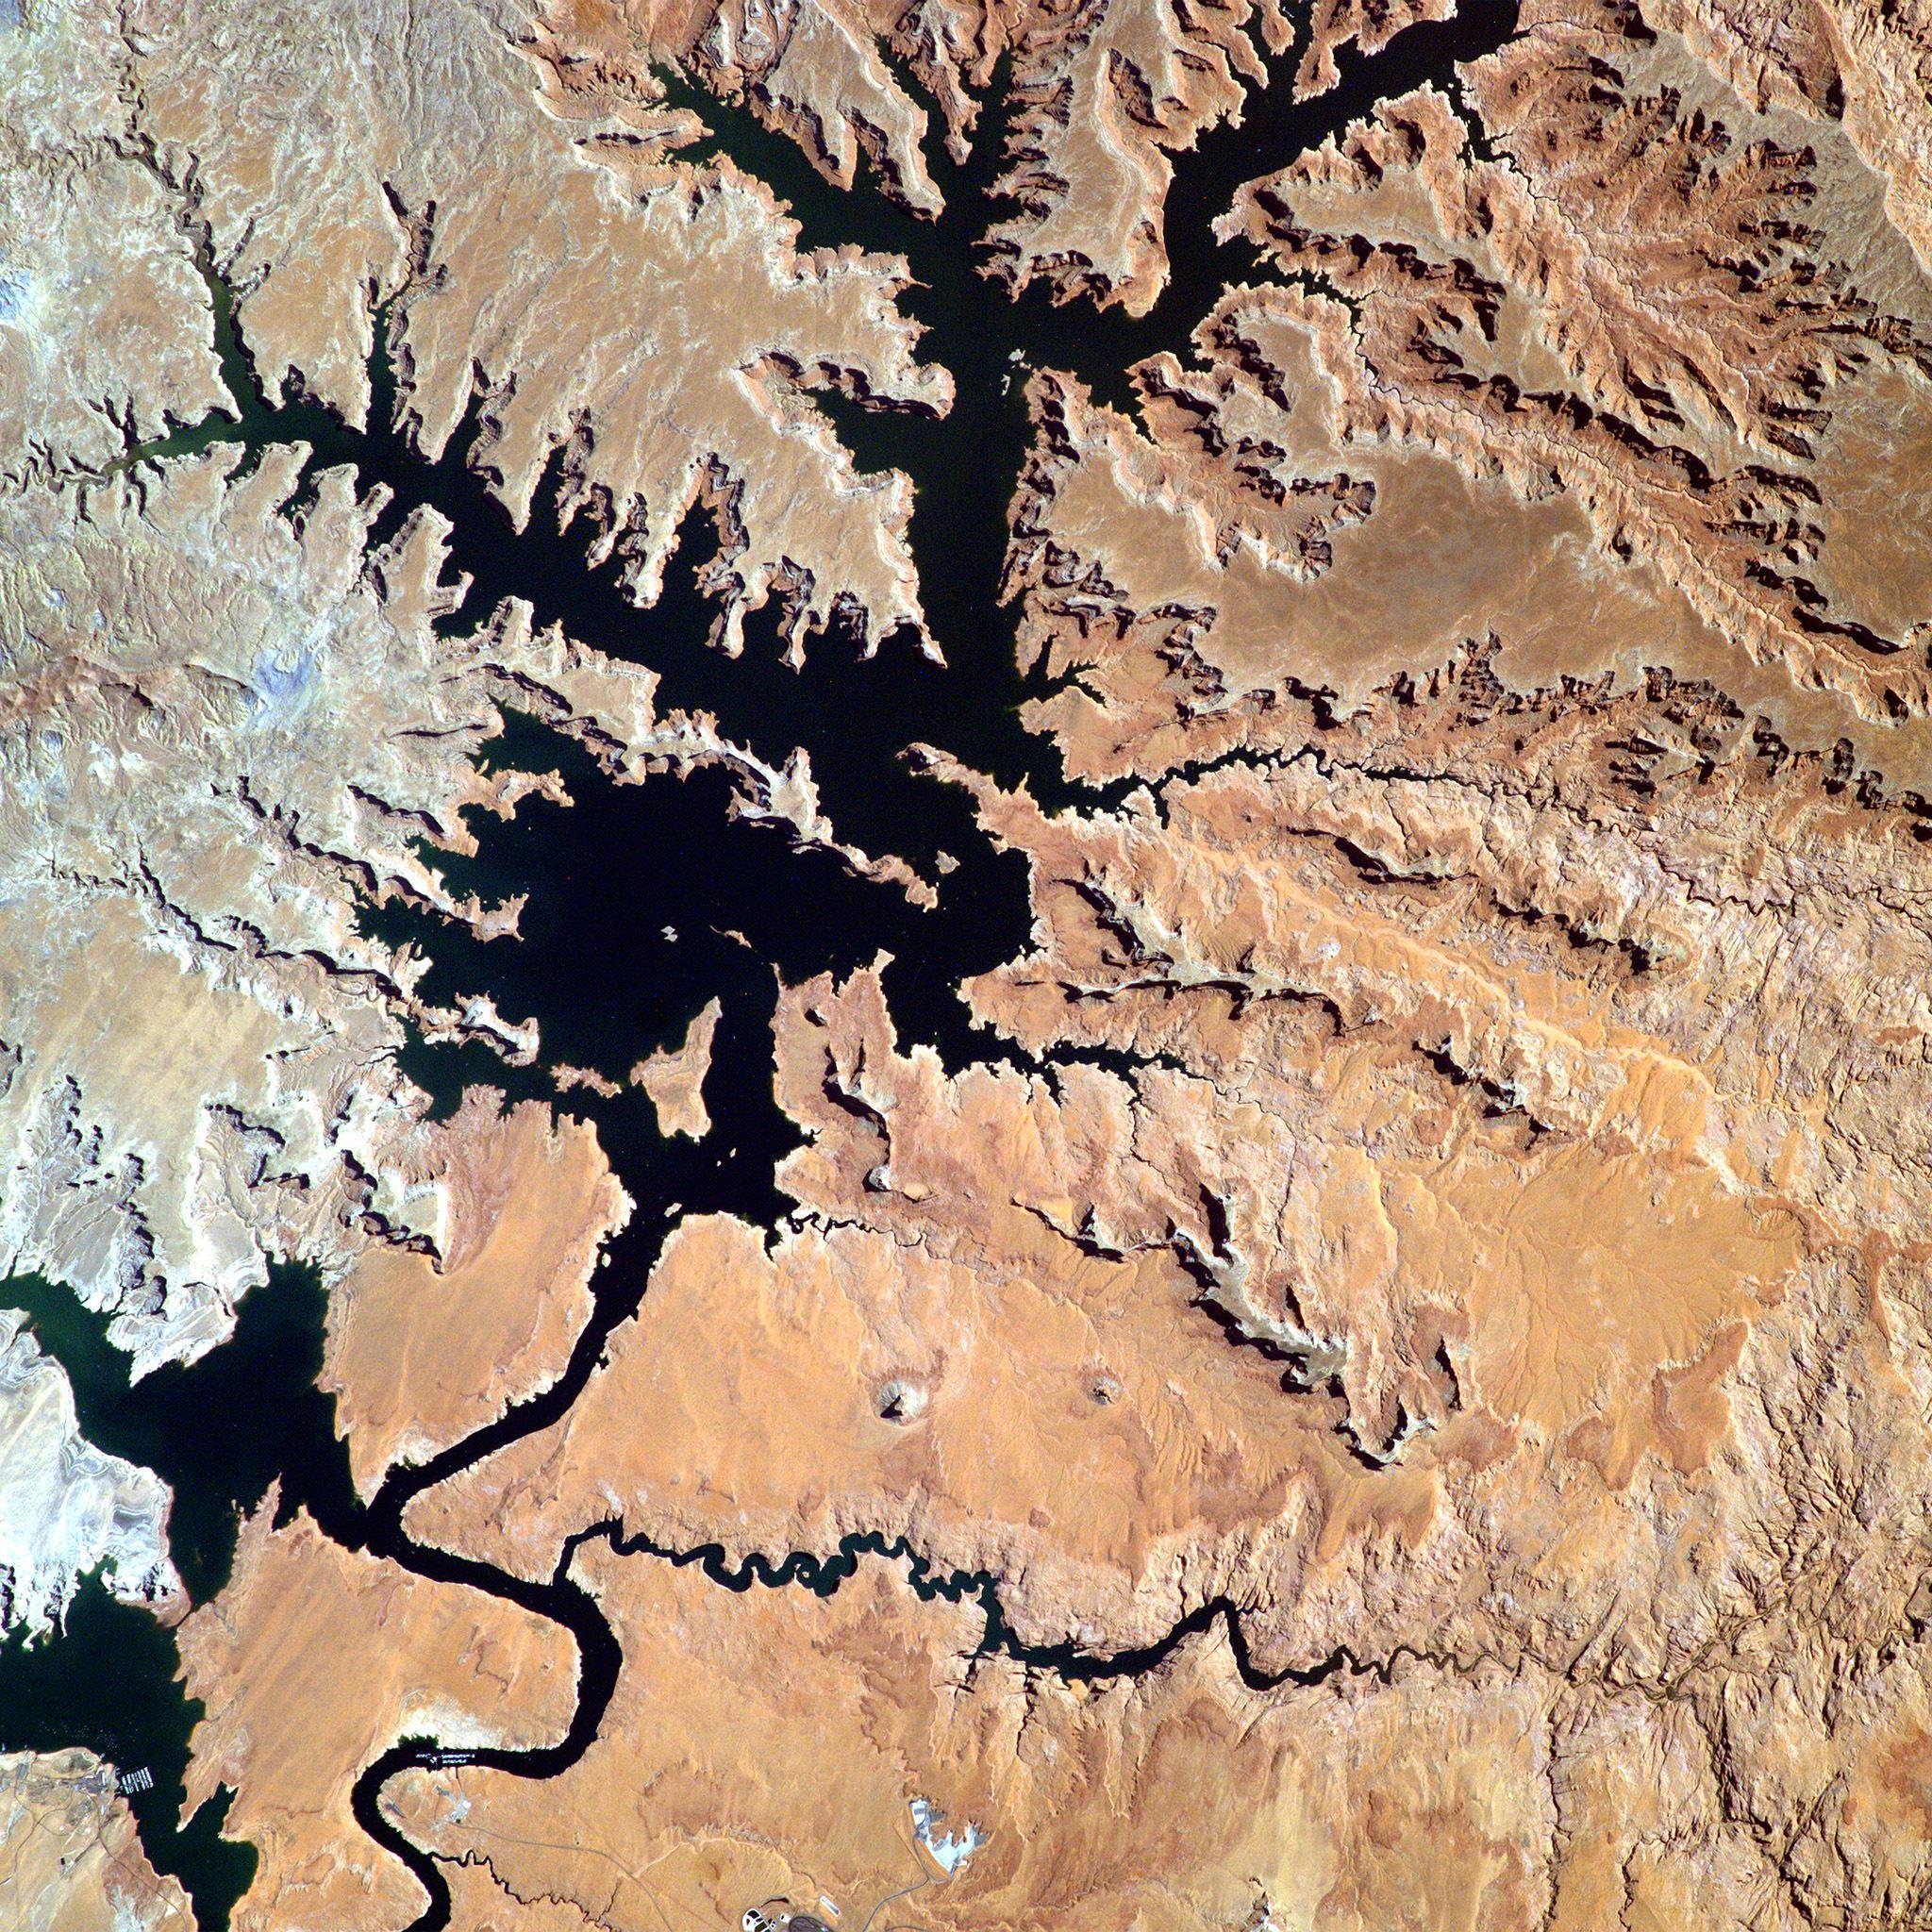 Land Earthview Rock River iPad Air wallpaper